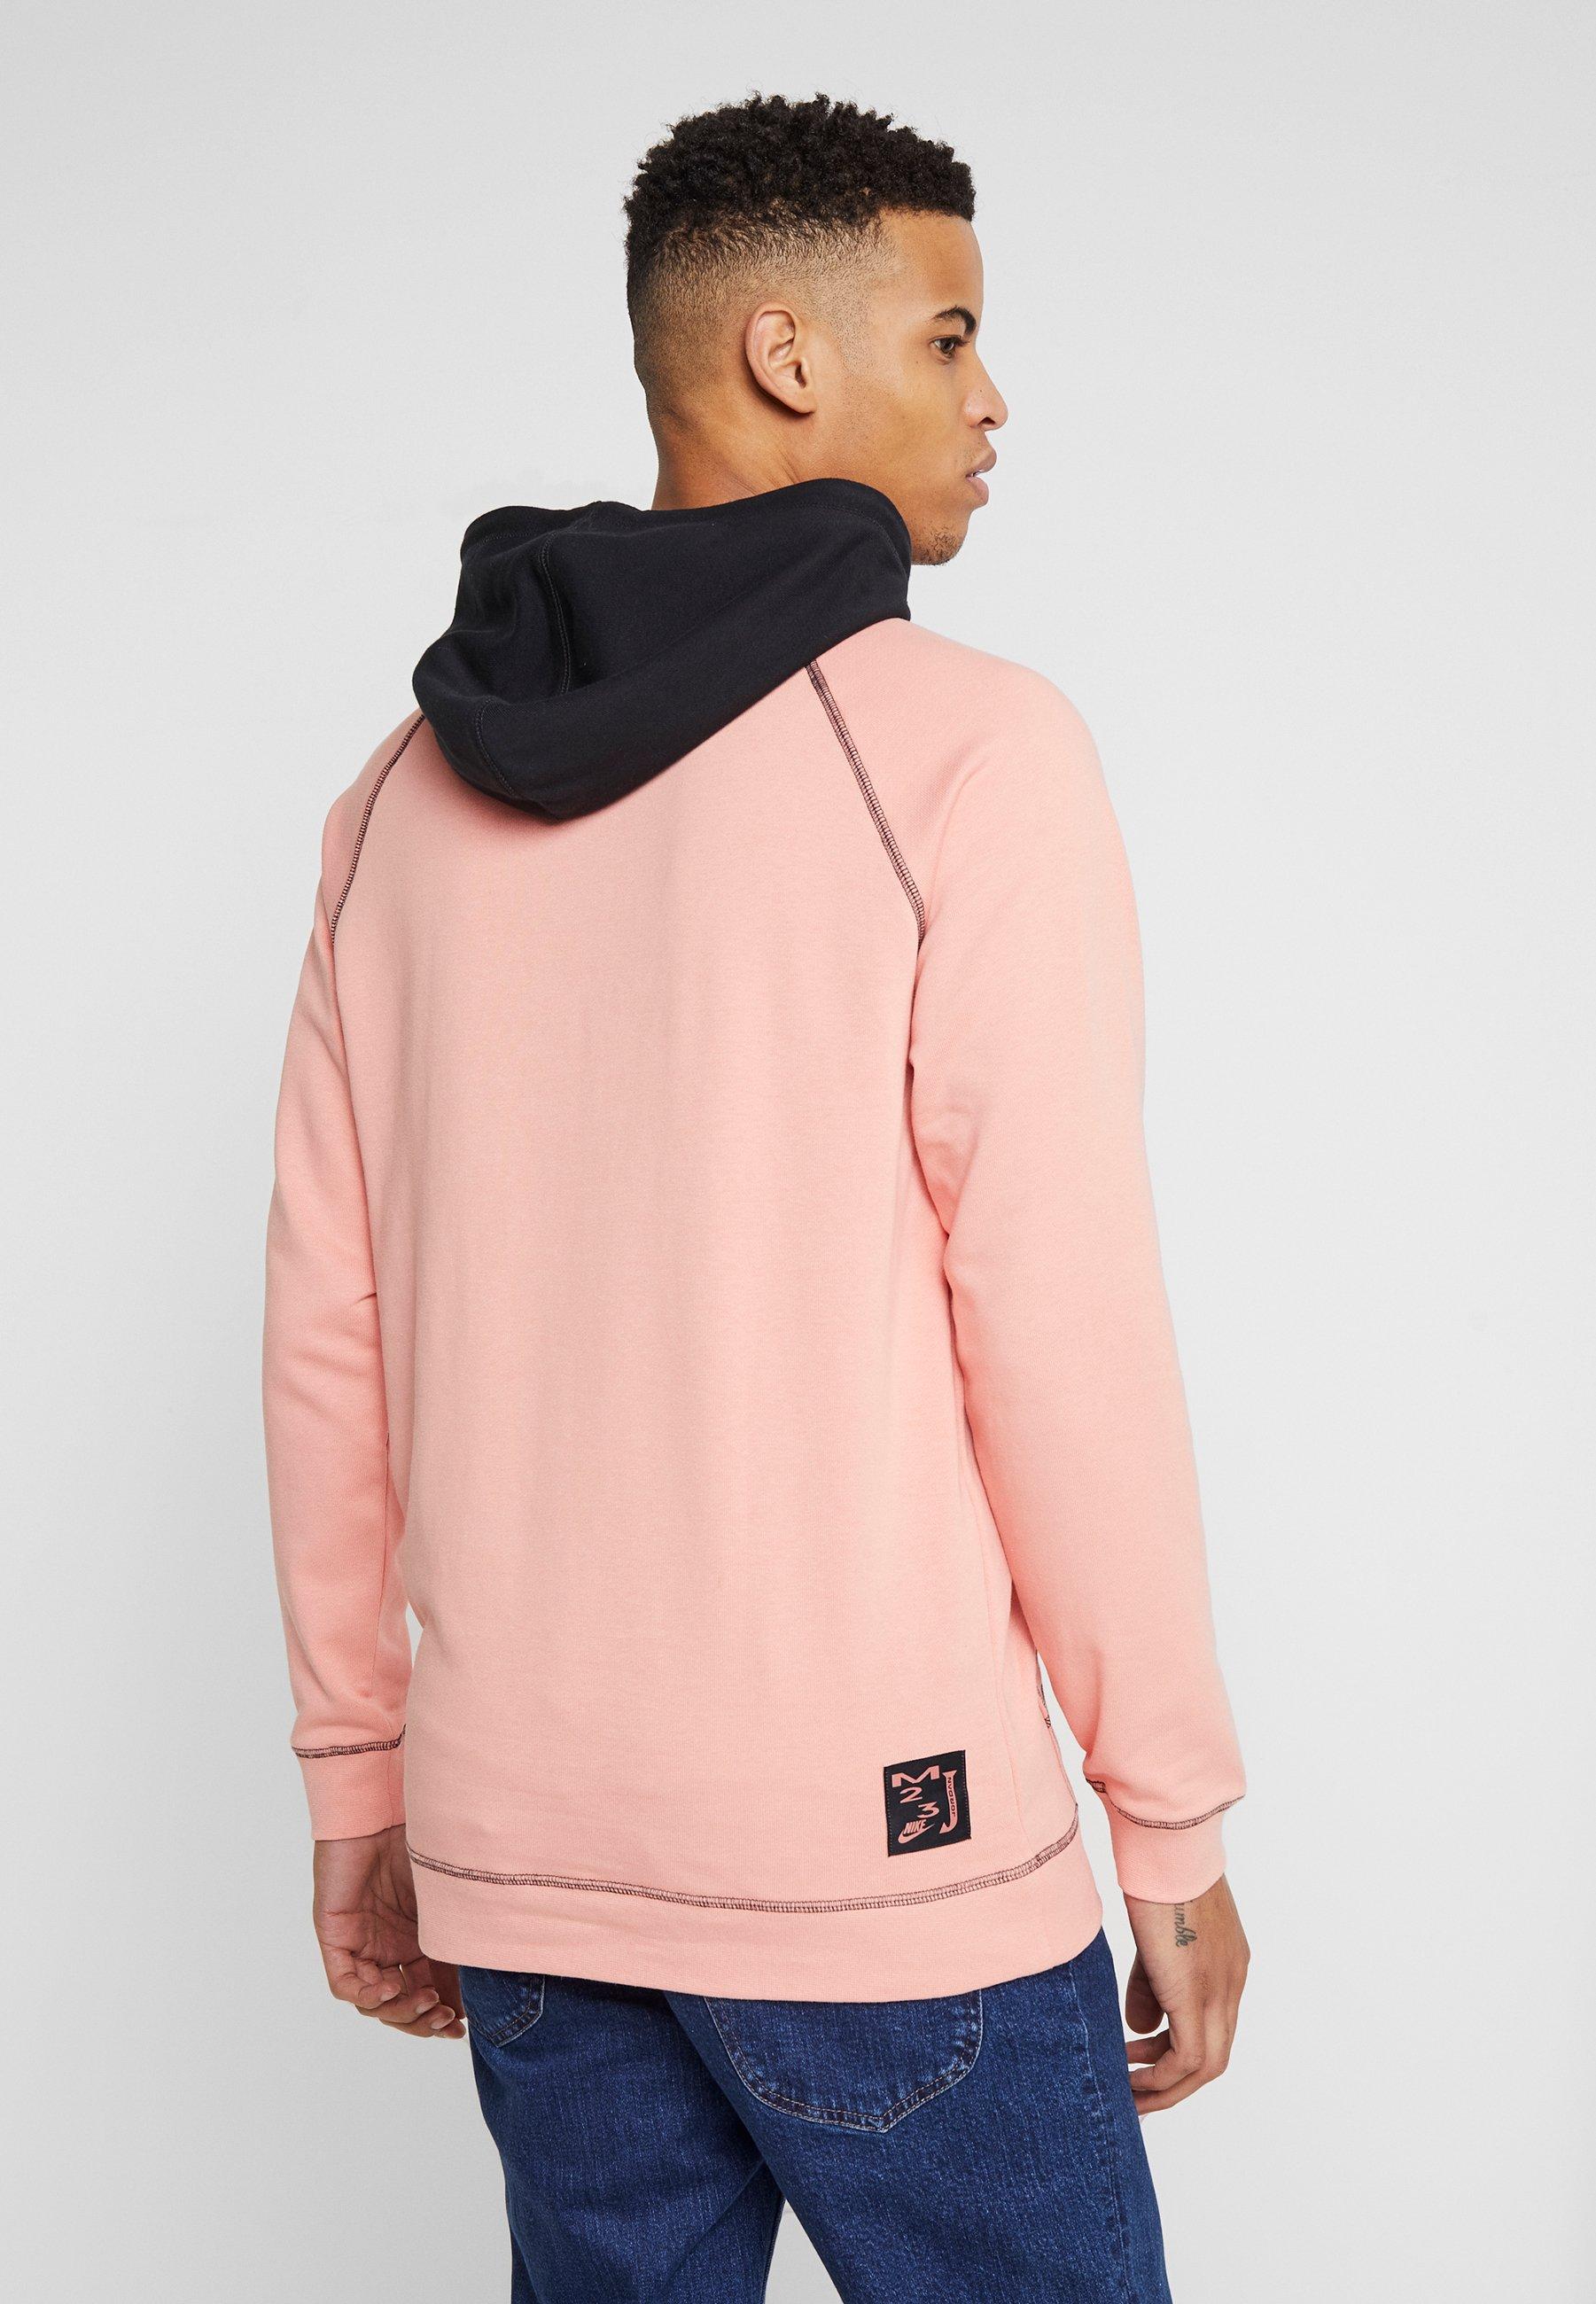 Jordan SPRTDNA HOODIE - Sweat à capuche - pink quartz/black